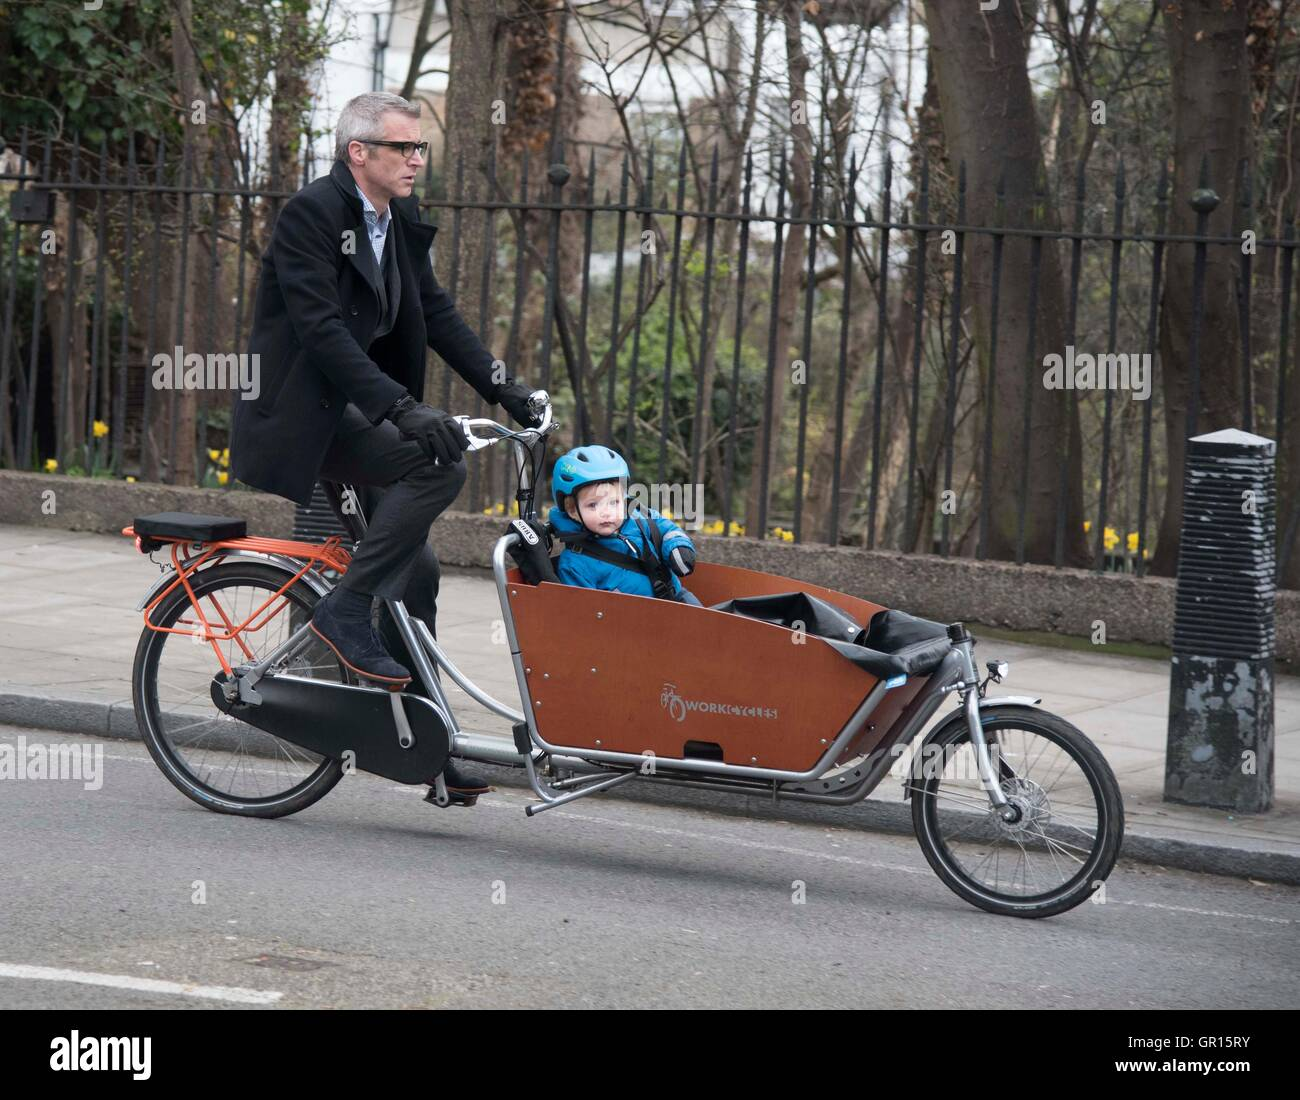 Radfahrer-Zyklus-Schule Sitz Fahrrad Kindersicherheit Stockbild